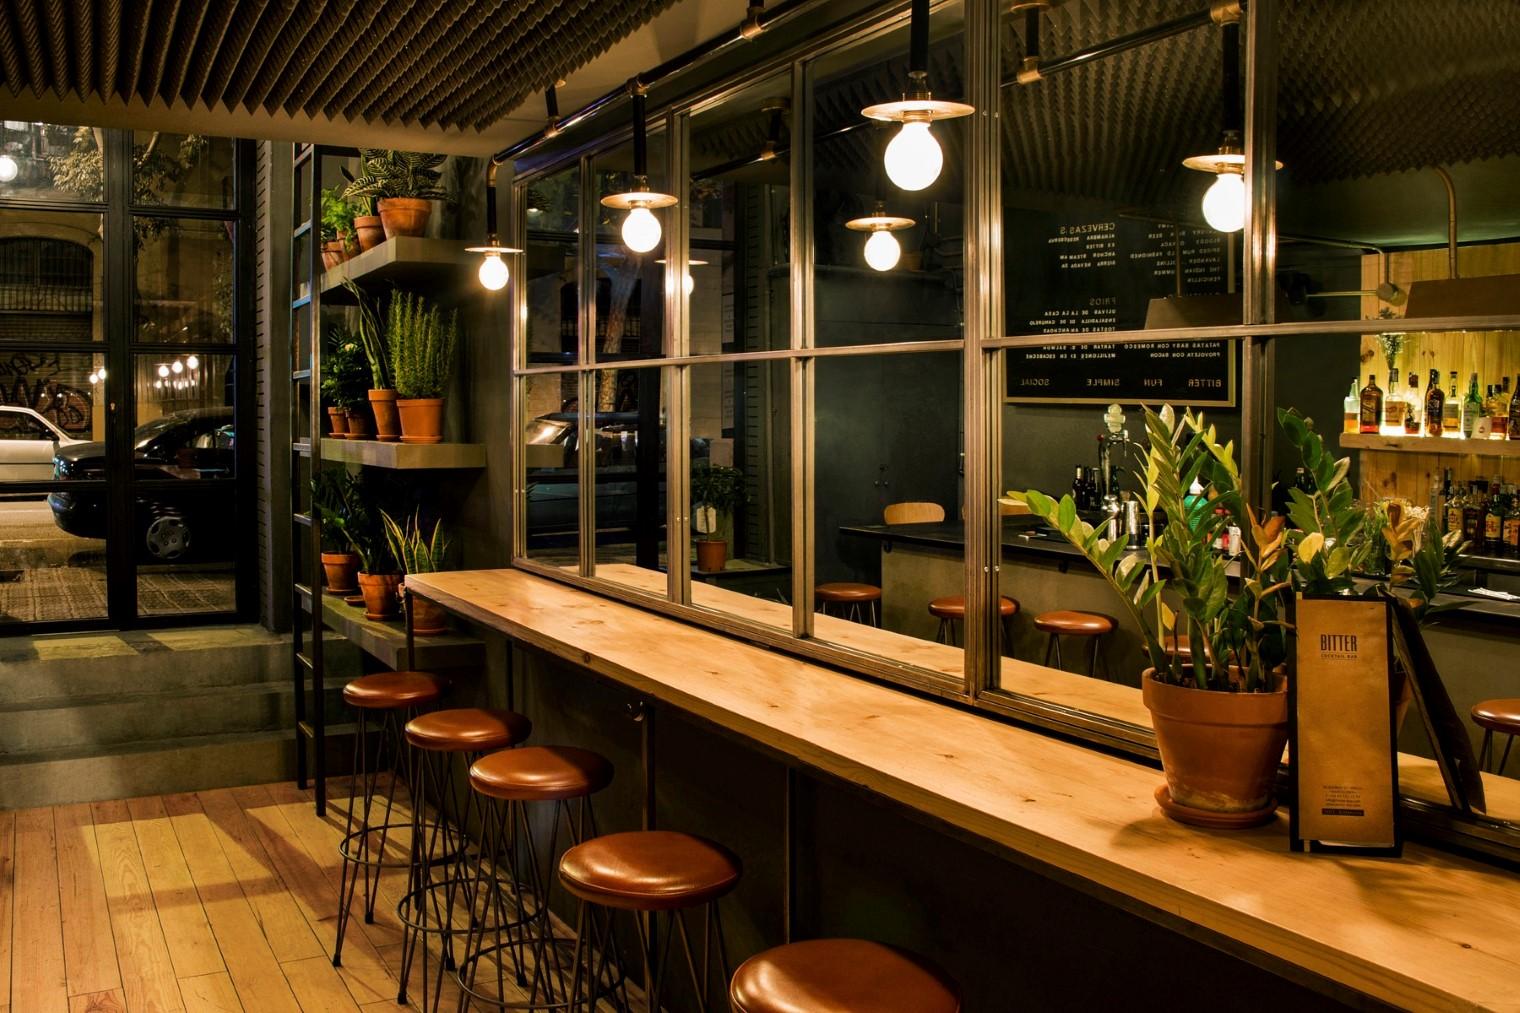 Una cocteleria muy hipster en barcelona bitter - Disenos para bares ...